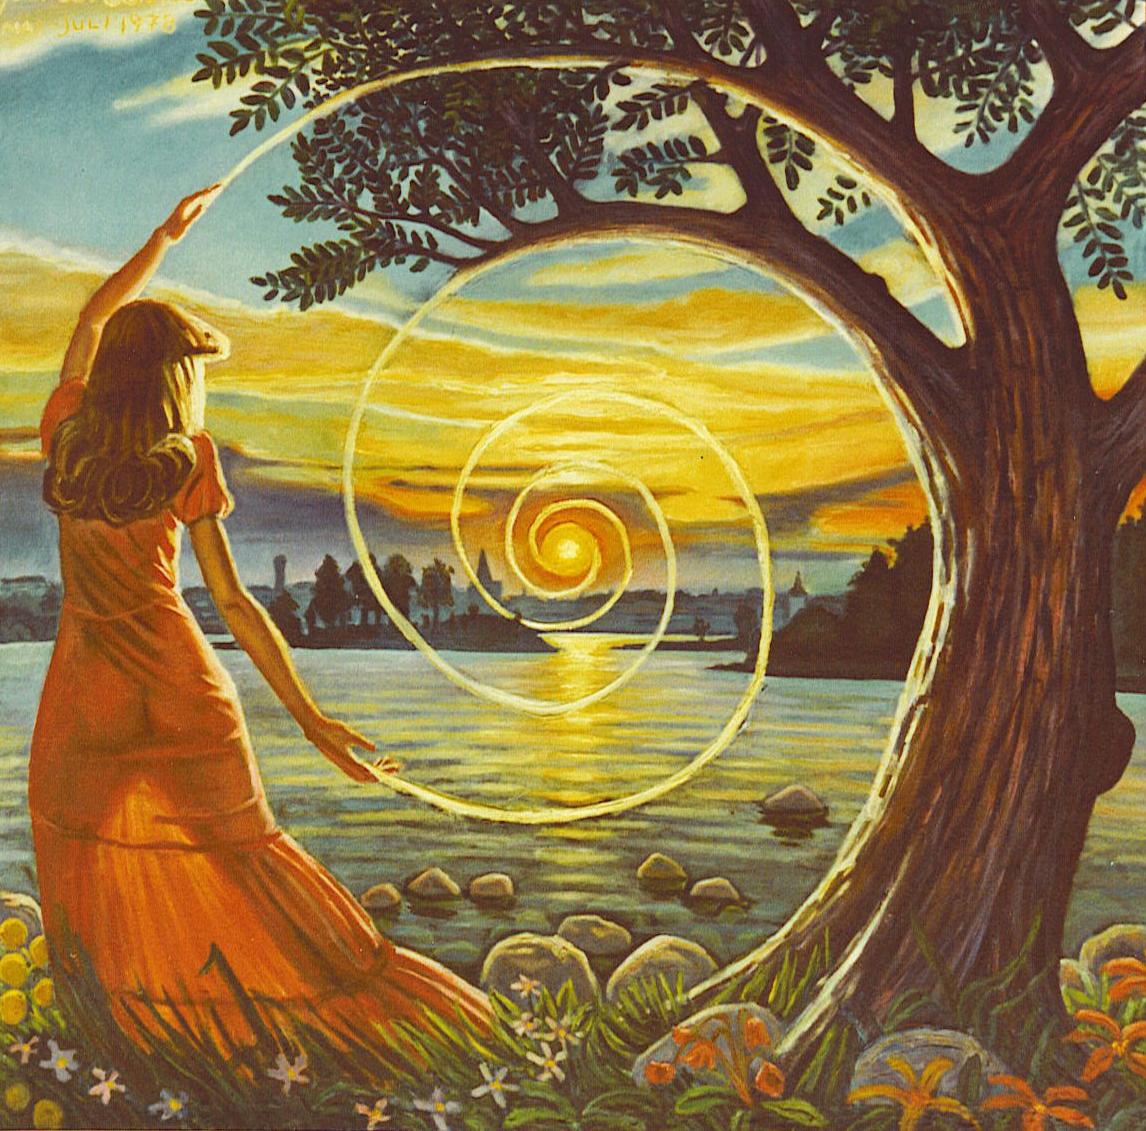 Spiral nature